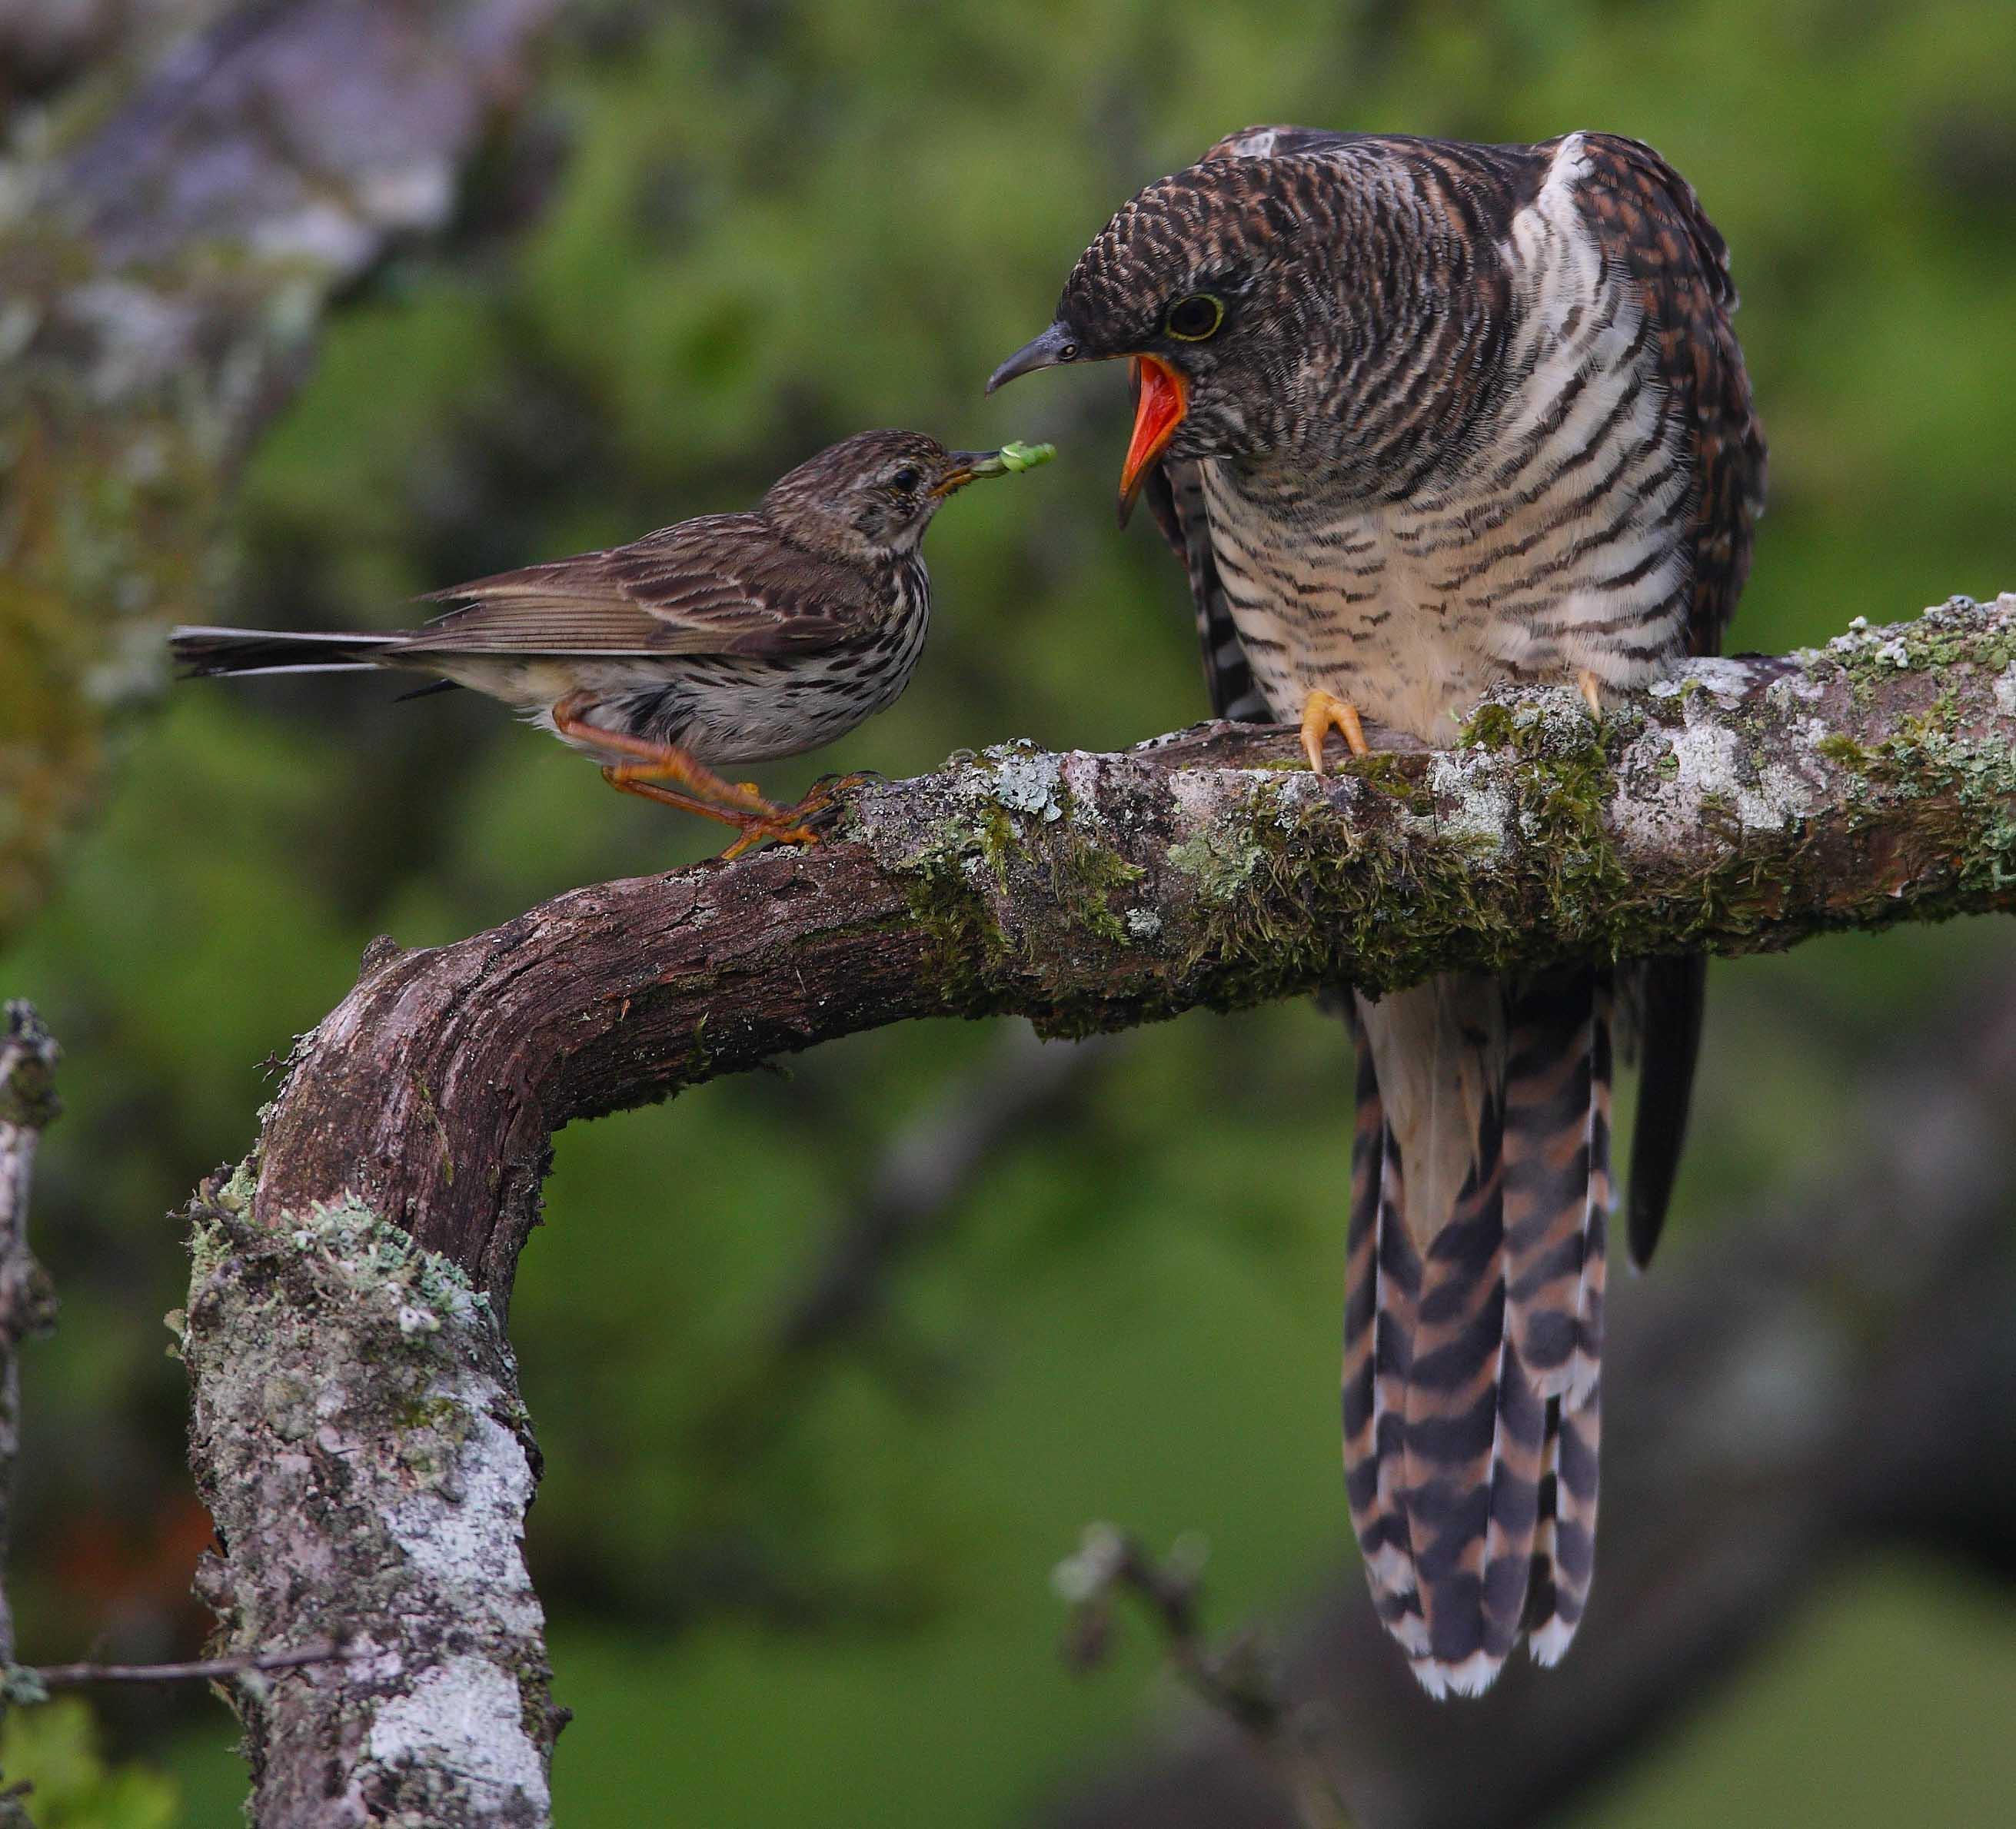 cuckoo harbinger of spring and cheat bloomsbury wildlife